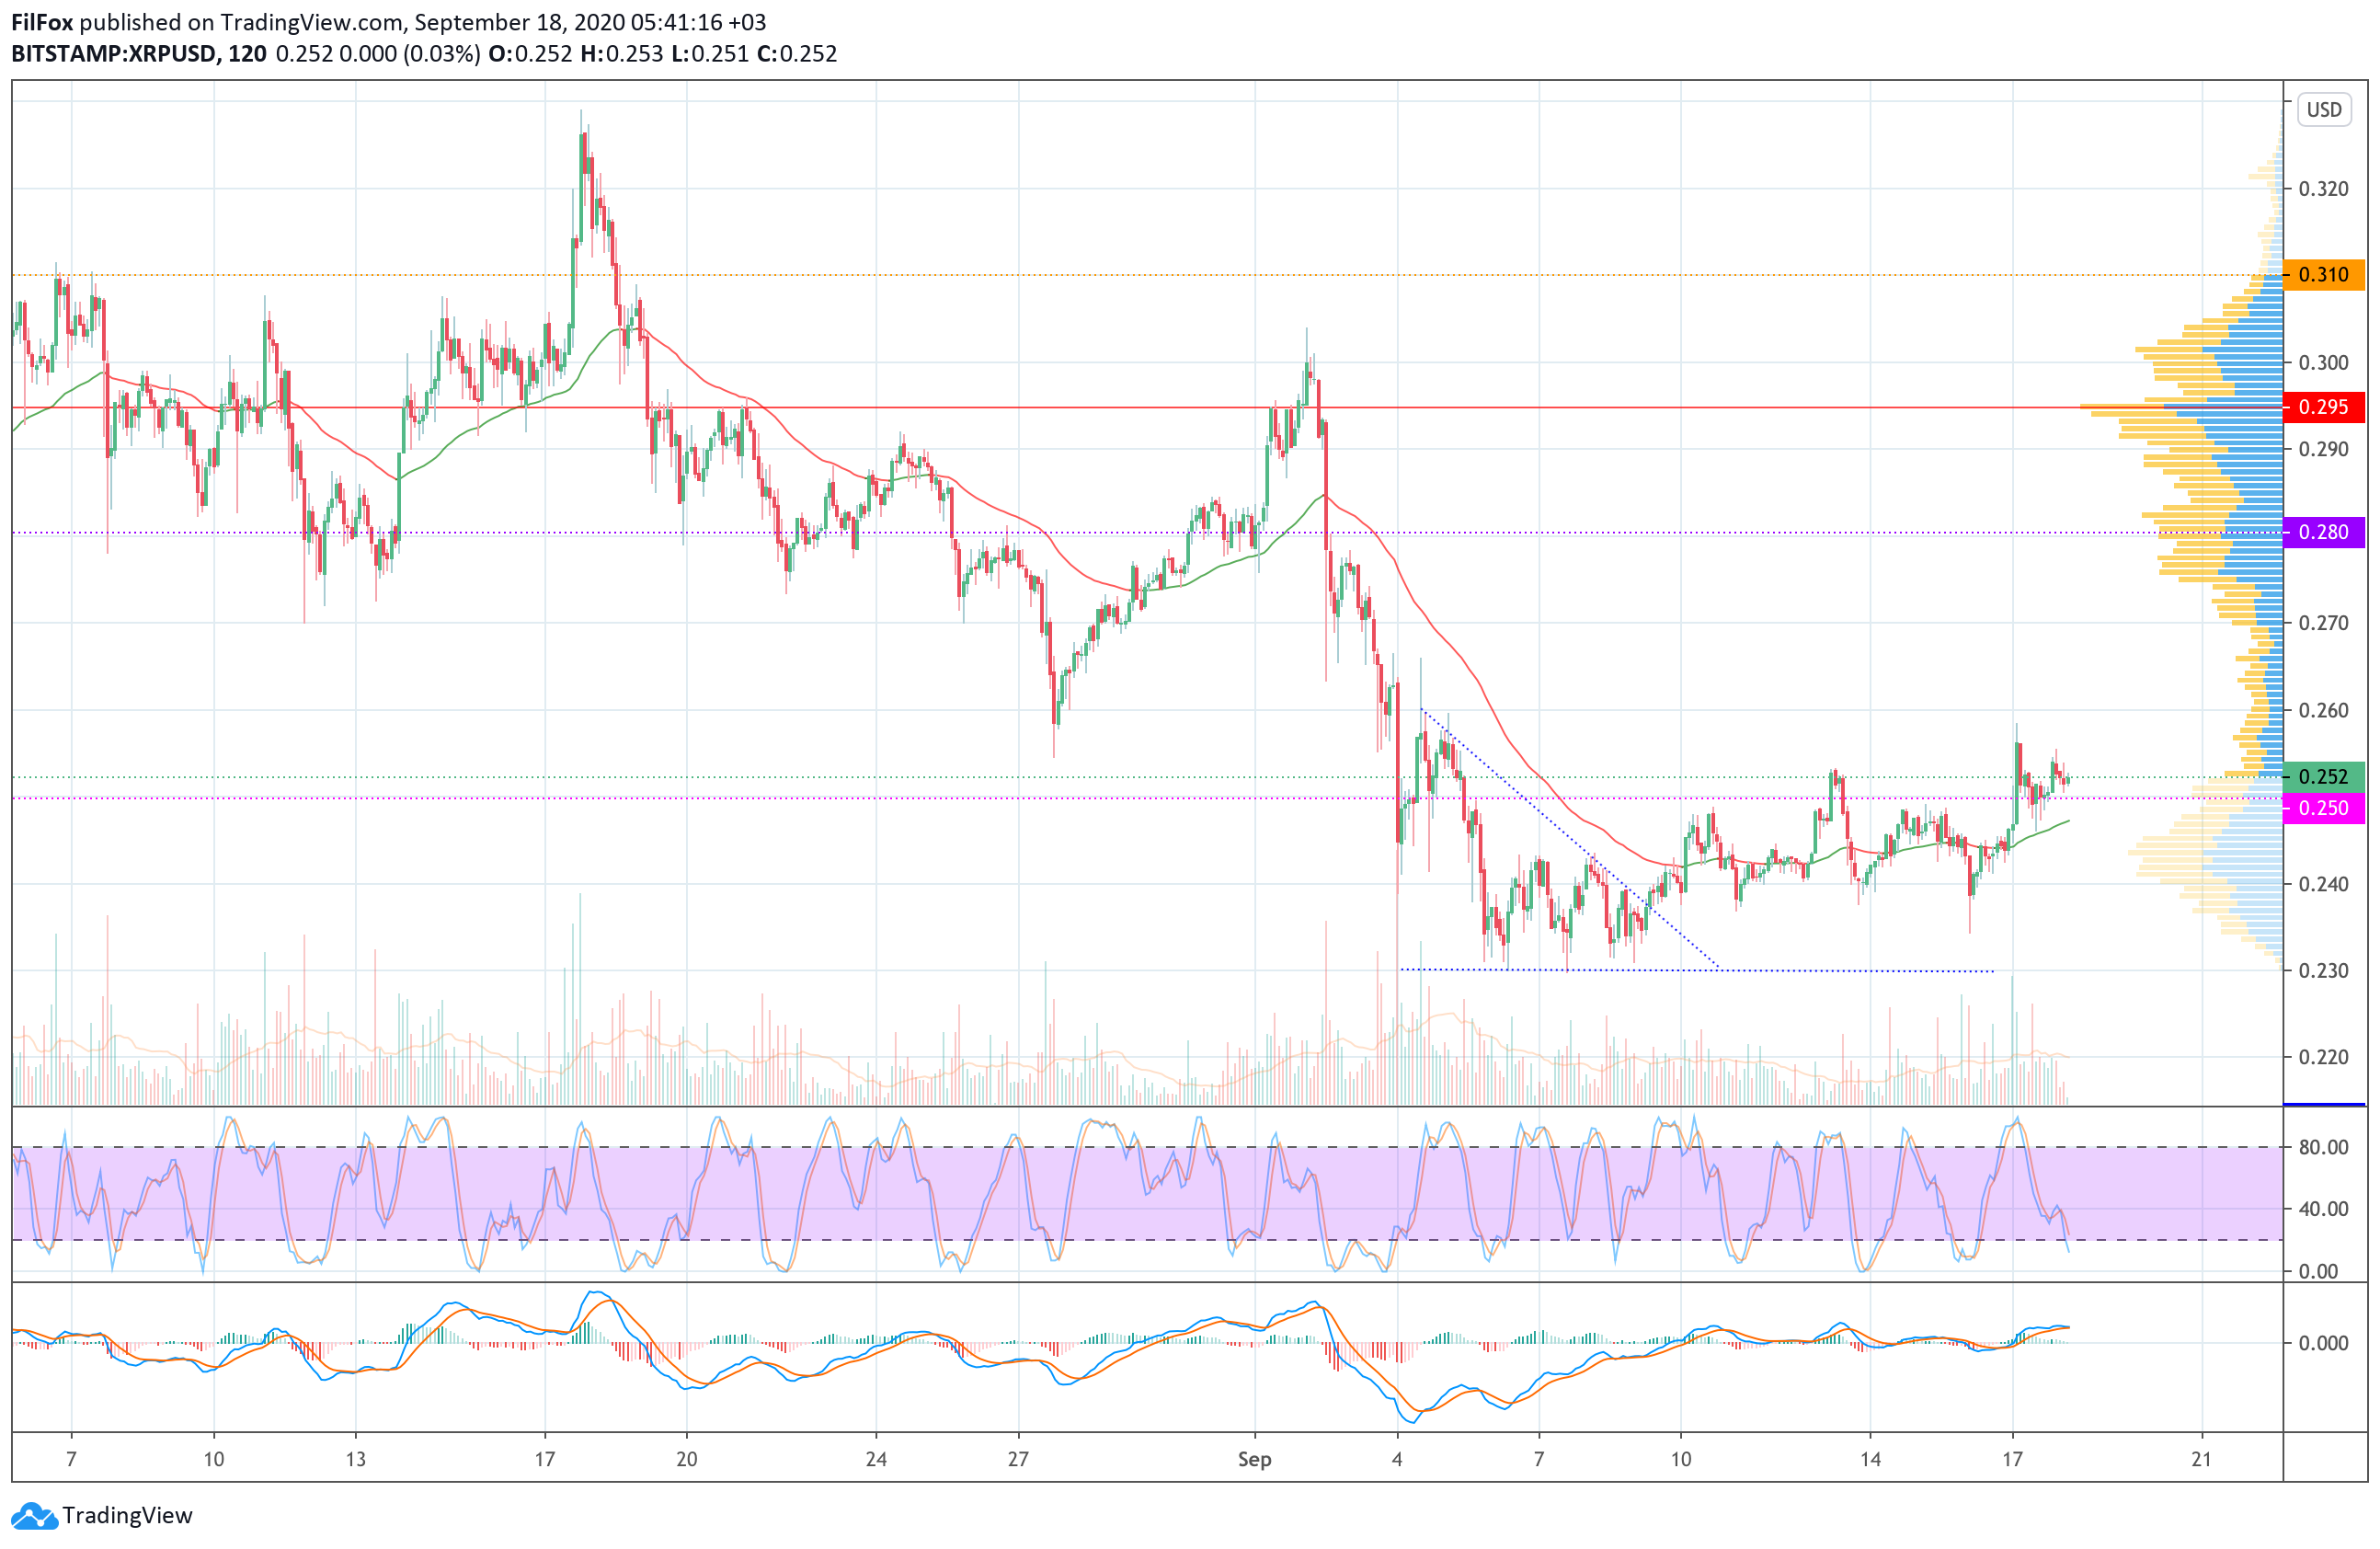 Анализ цен BTC, ETH, XRP (18.09.20)